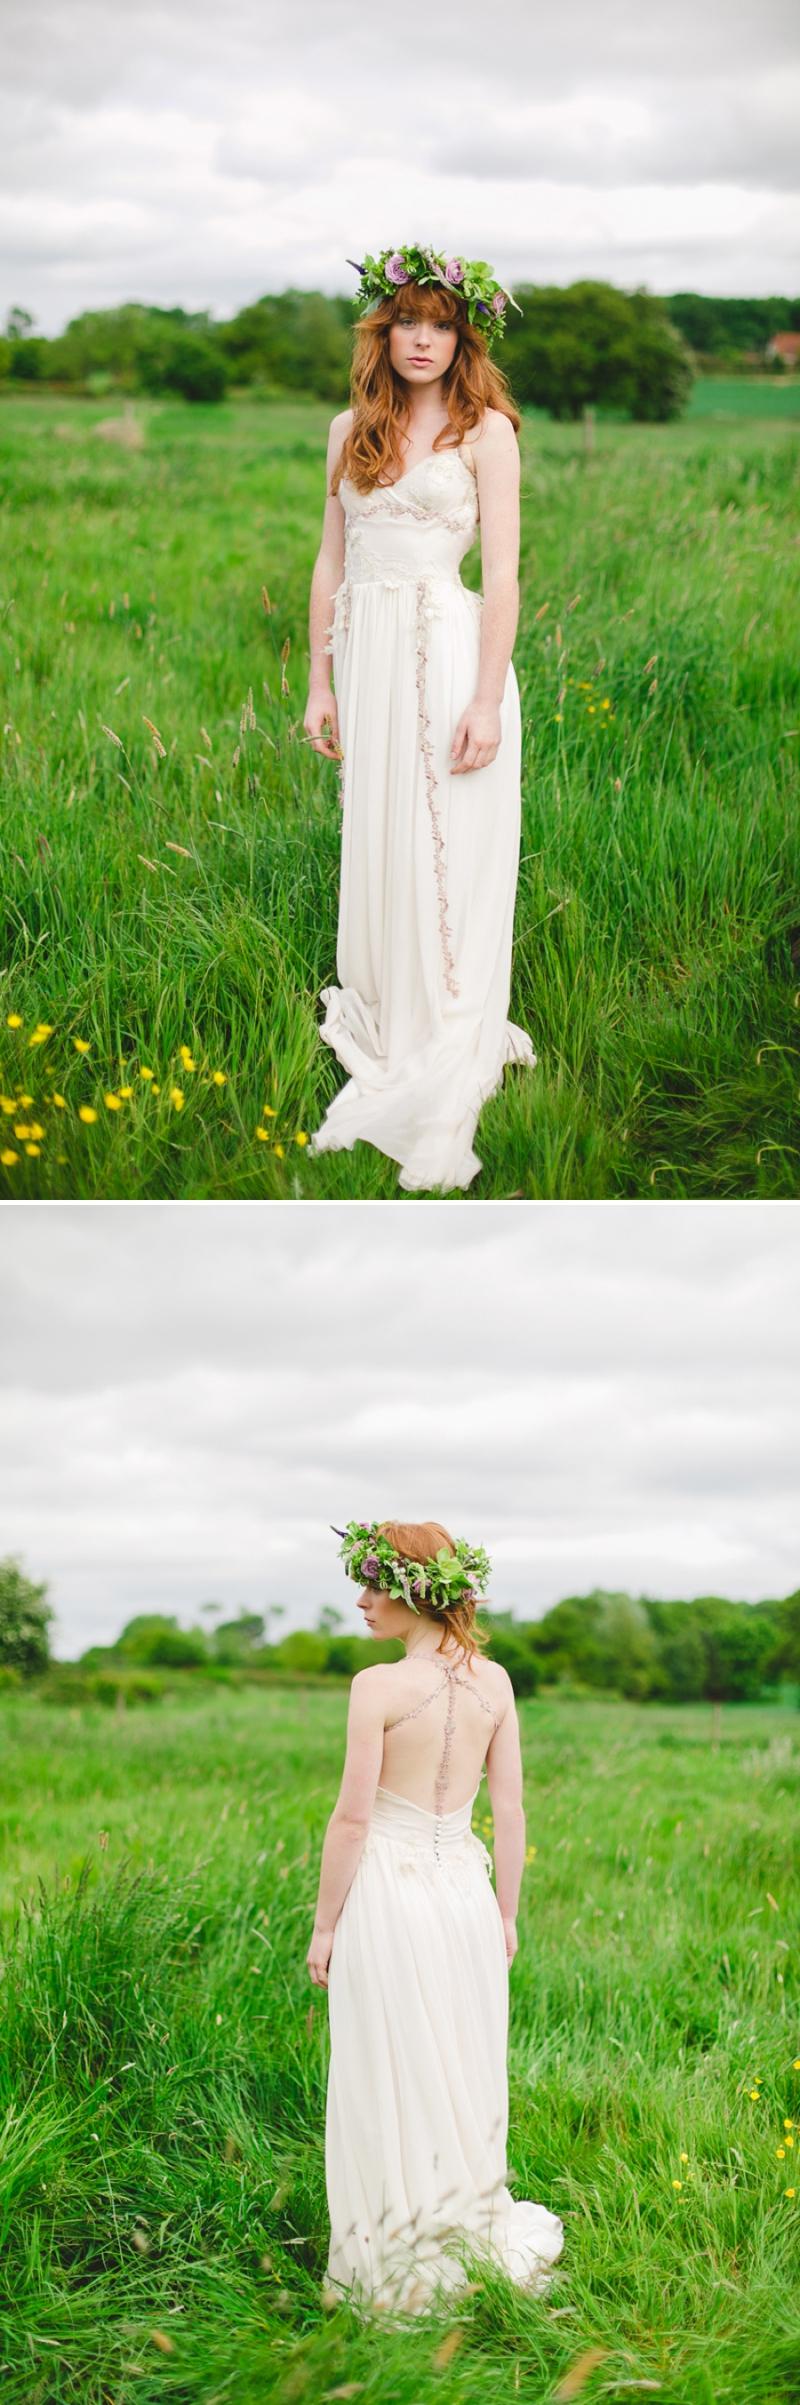 Dana Bolton Vintage Inspired Wedding Dress Collection